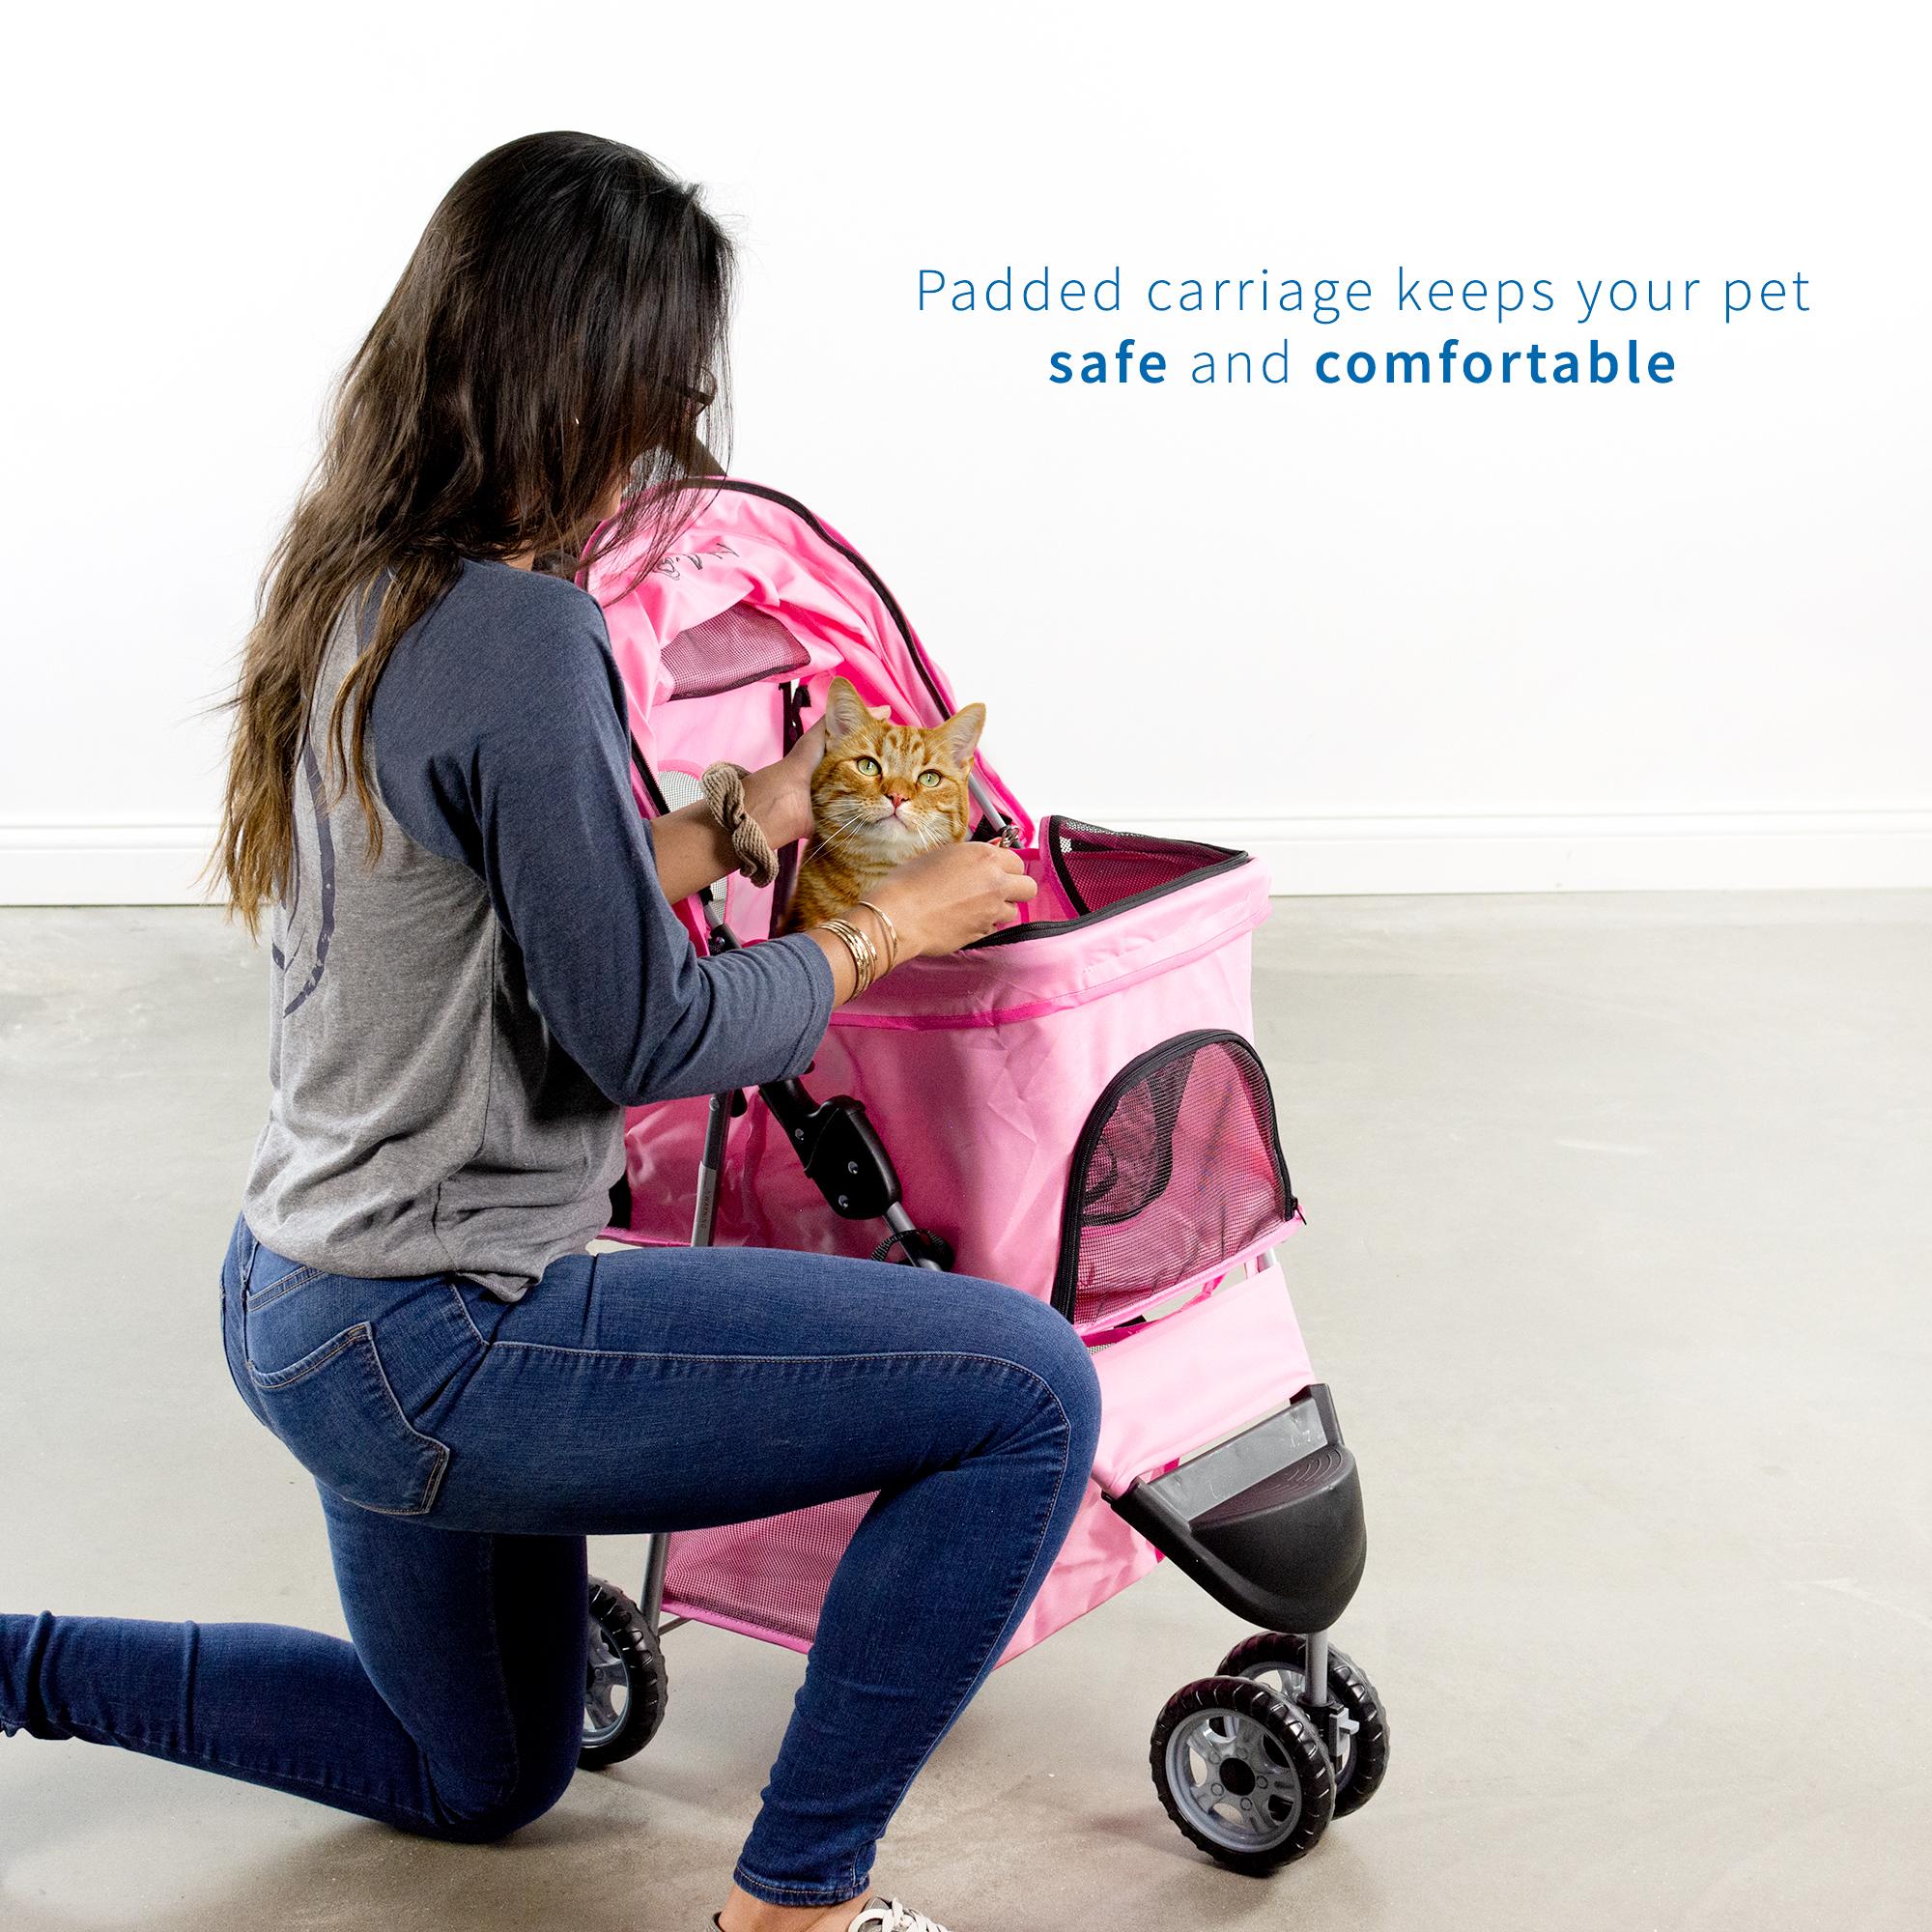 thumbnail 17 - VIVO Three Wheel Pet Stroller / Cat & Dog Foldable Carrier Strolling Cart